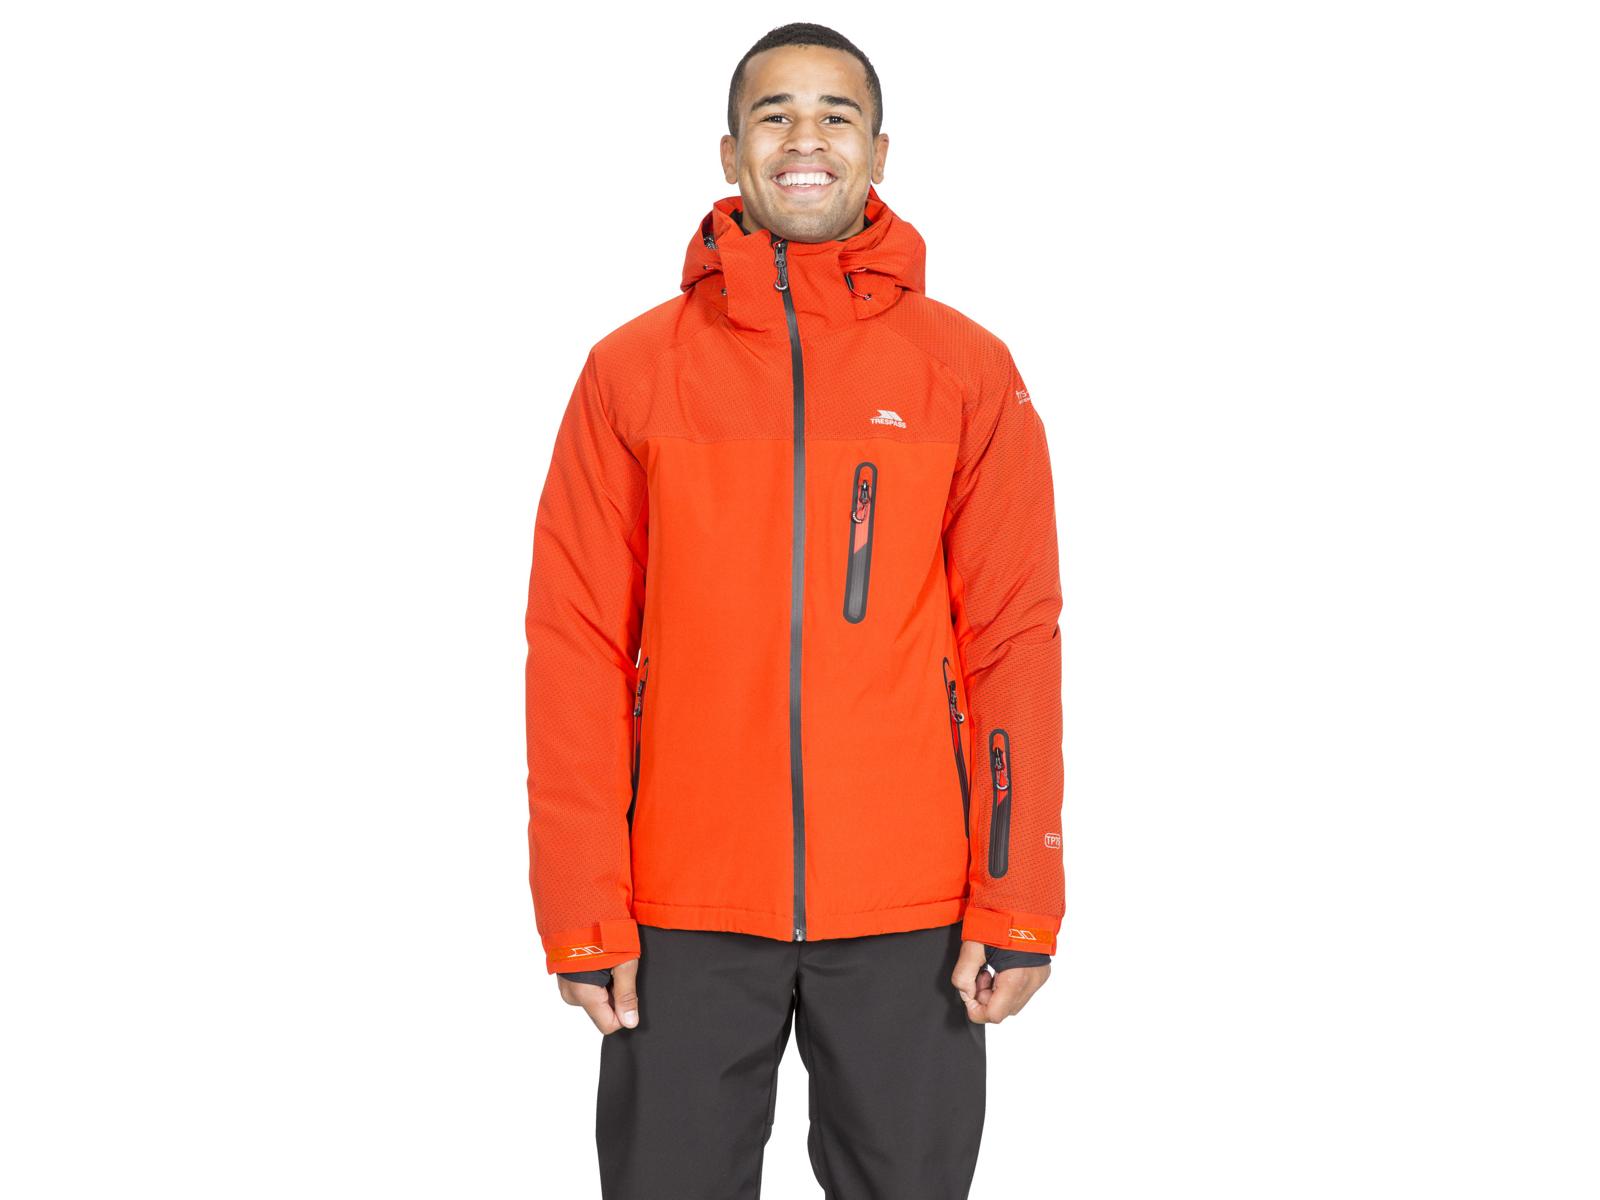 Trespass Appin Ski Jacket Orange (NOK 1 470,75)